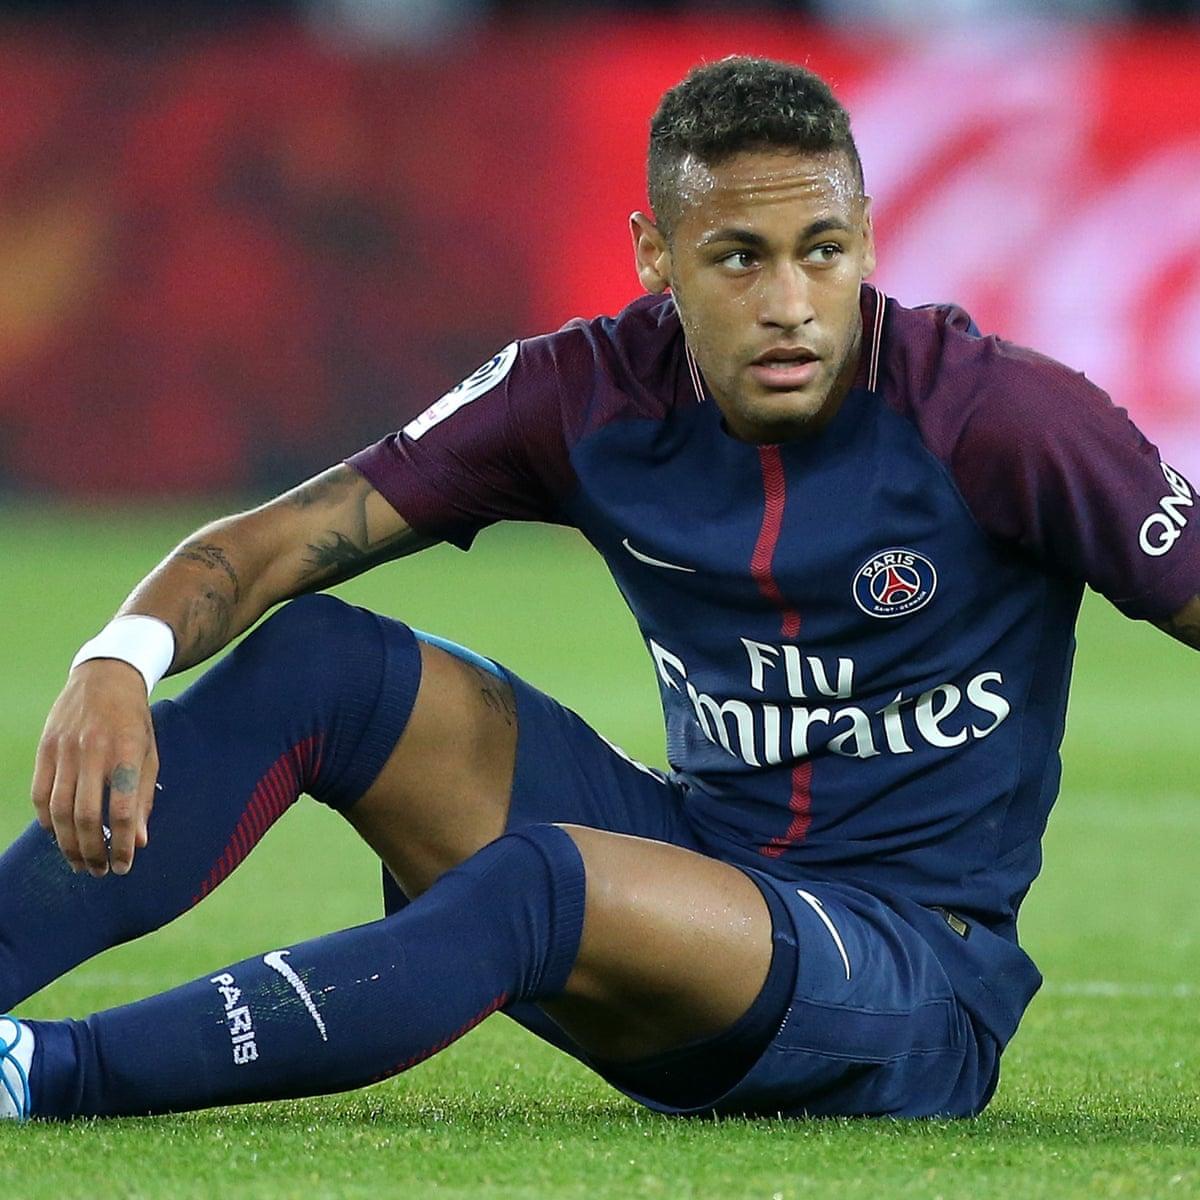 Psg Accused Of Peeing In The Pool On Ffp Rules Over Neymar S 200m Move Paris Saint Germain The Guardian